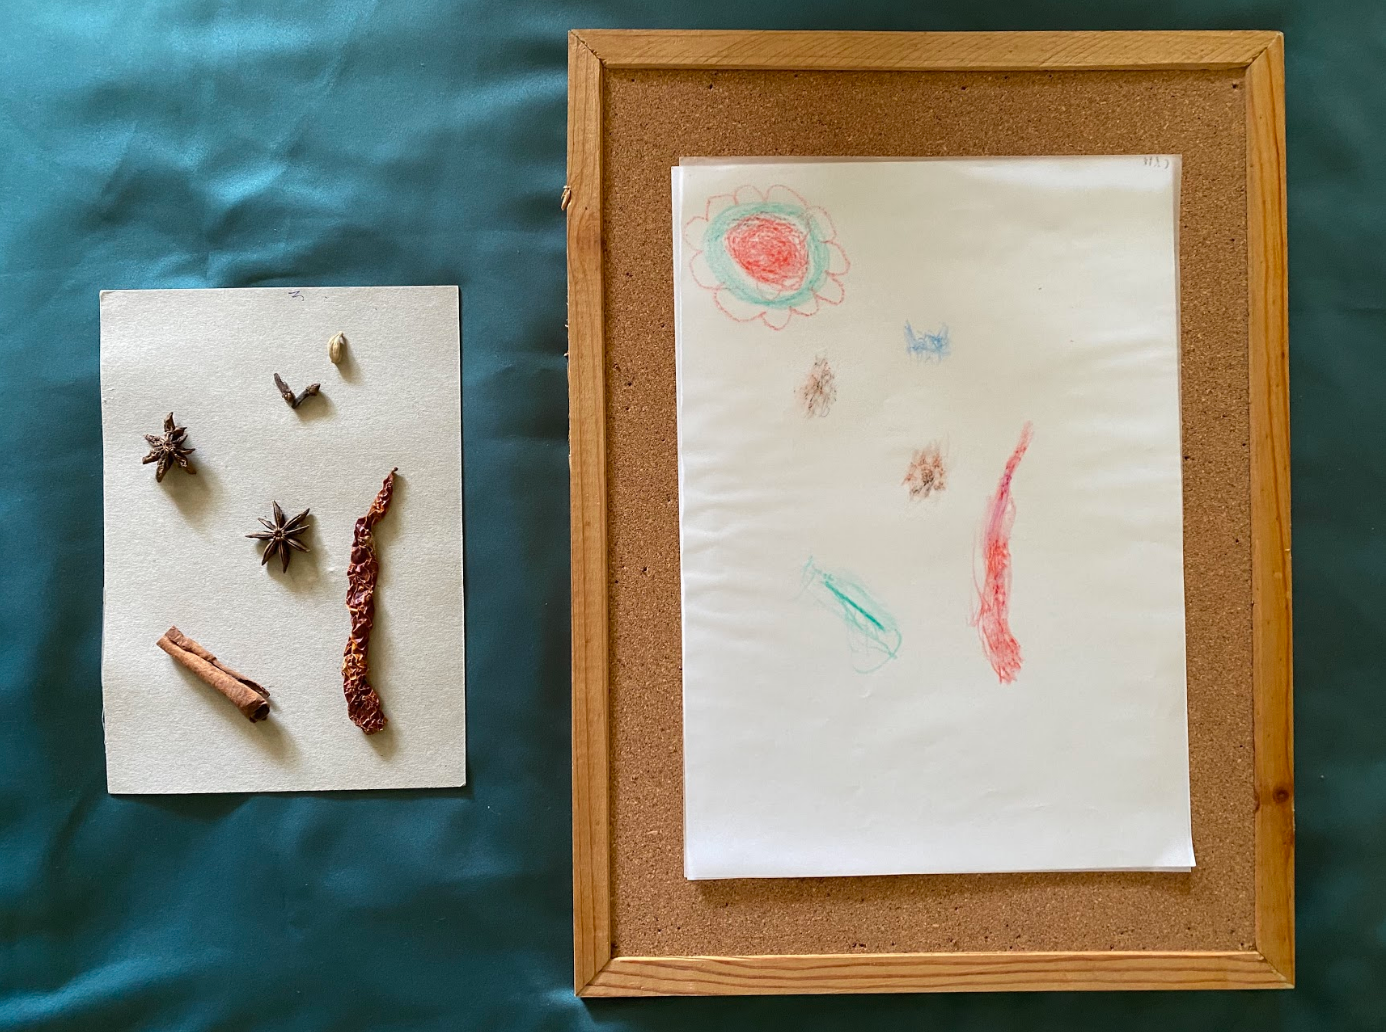 [Mdm Chan Yoke Heng] Untitled, pastel rubbing on tracing paper, 29.7cm x 21cm